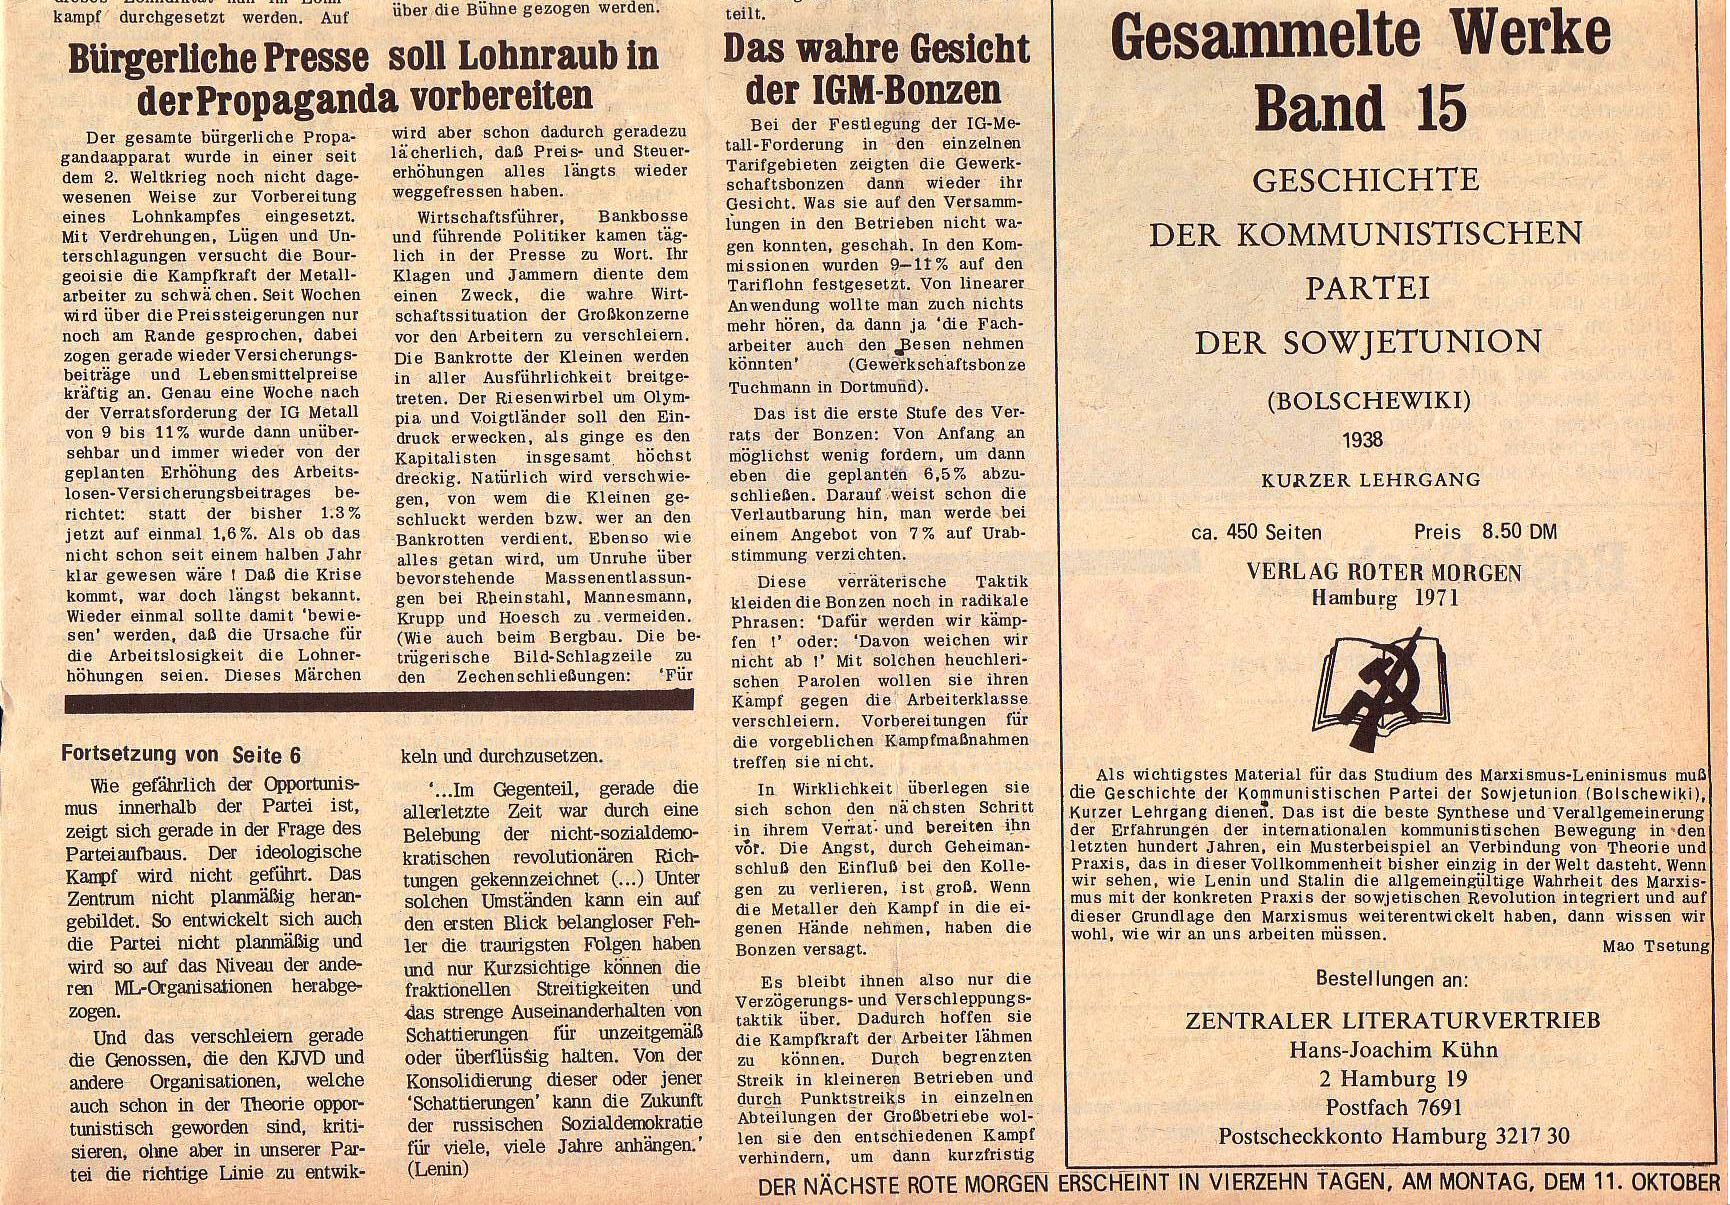 Roter Morgen, 5. Jg., 27. September 1971, Nr. 10, Seite 7b